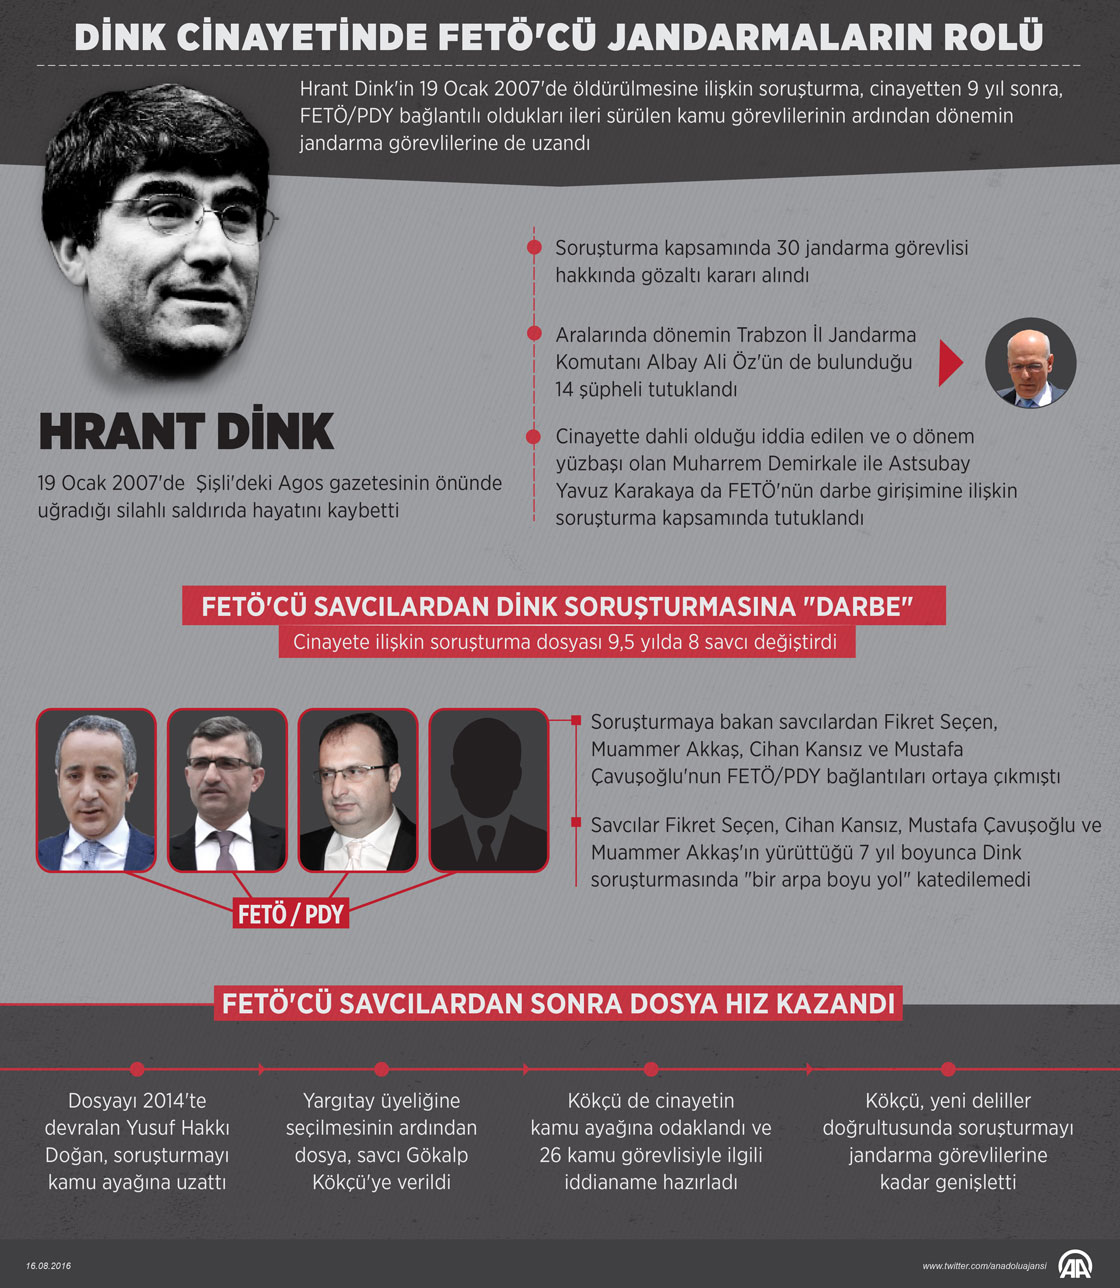 dink_cinayeti.jpg